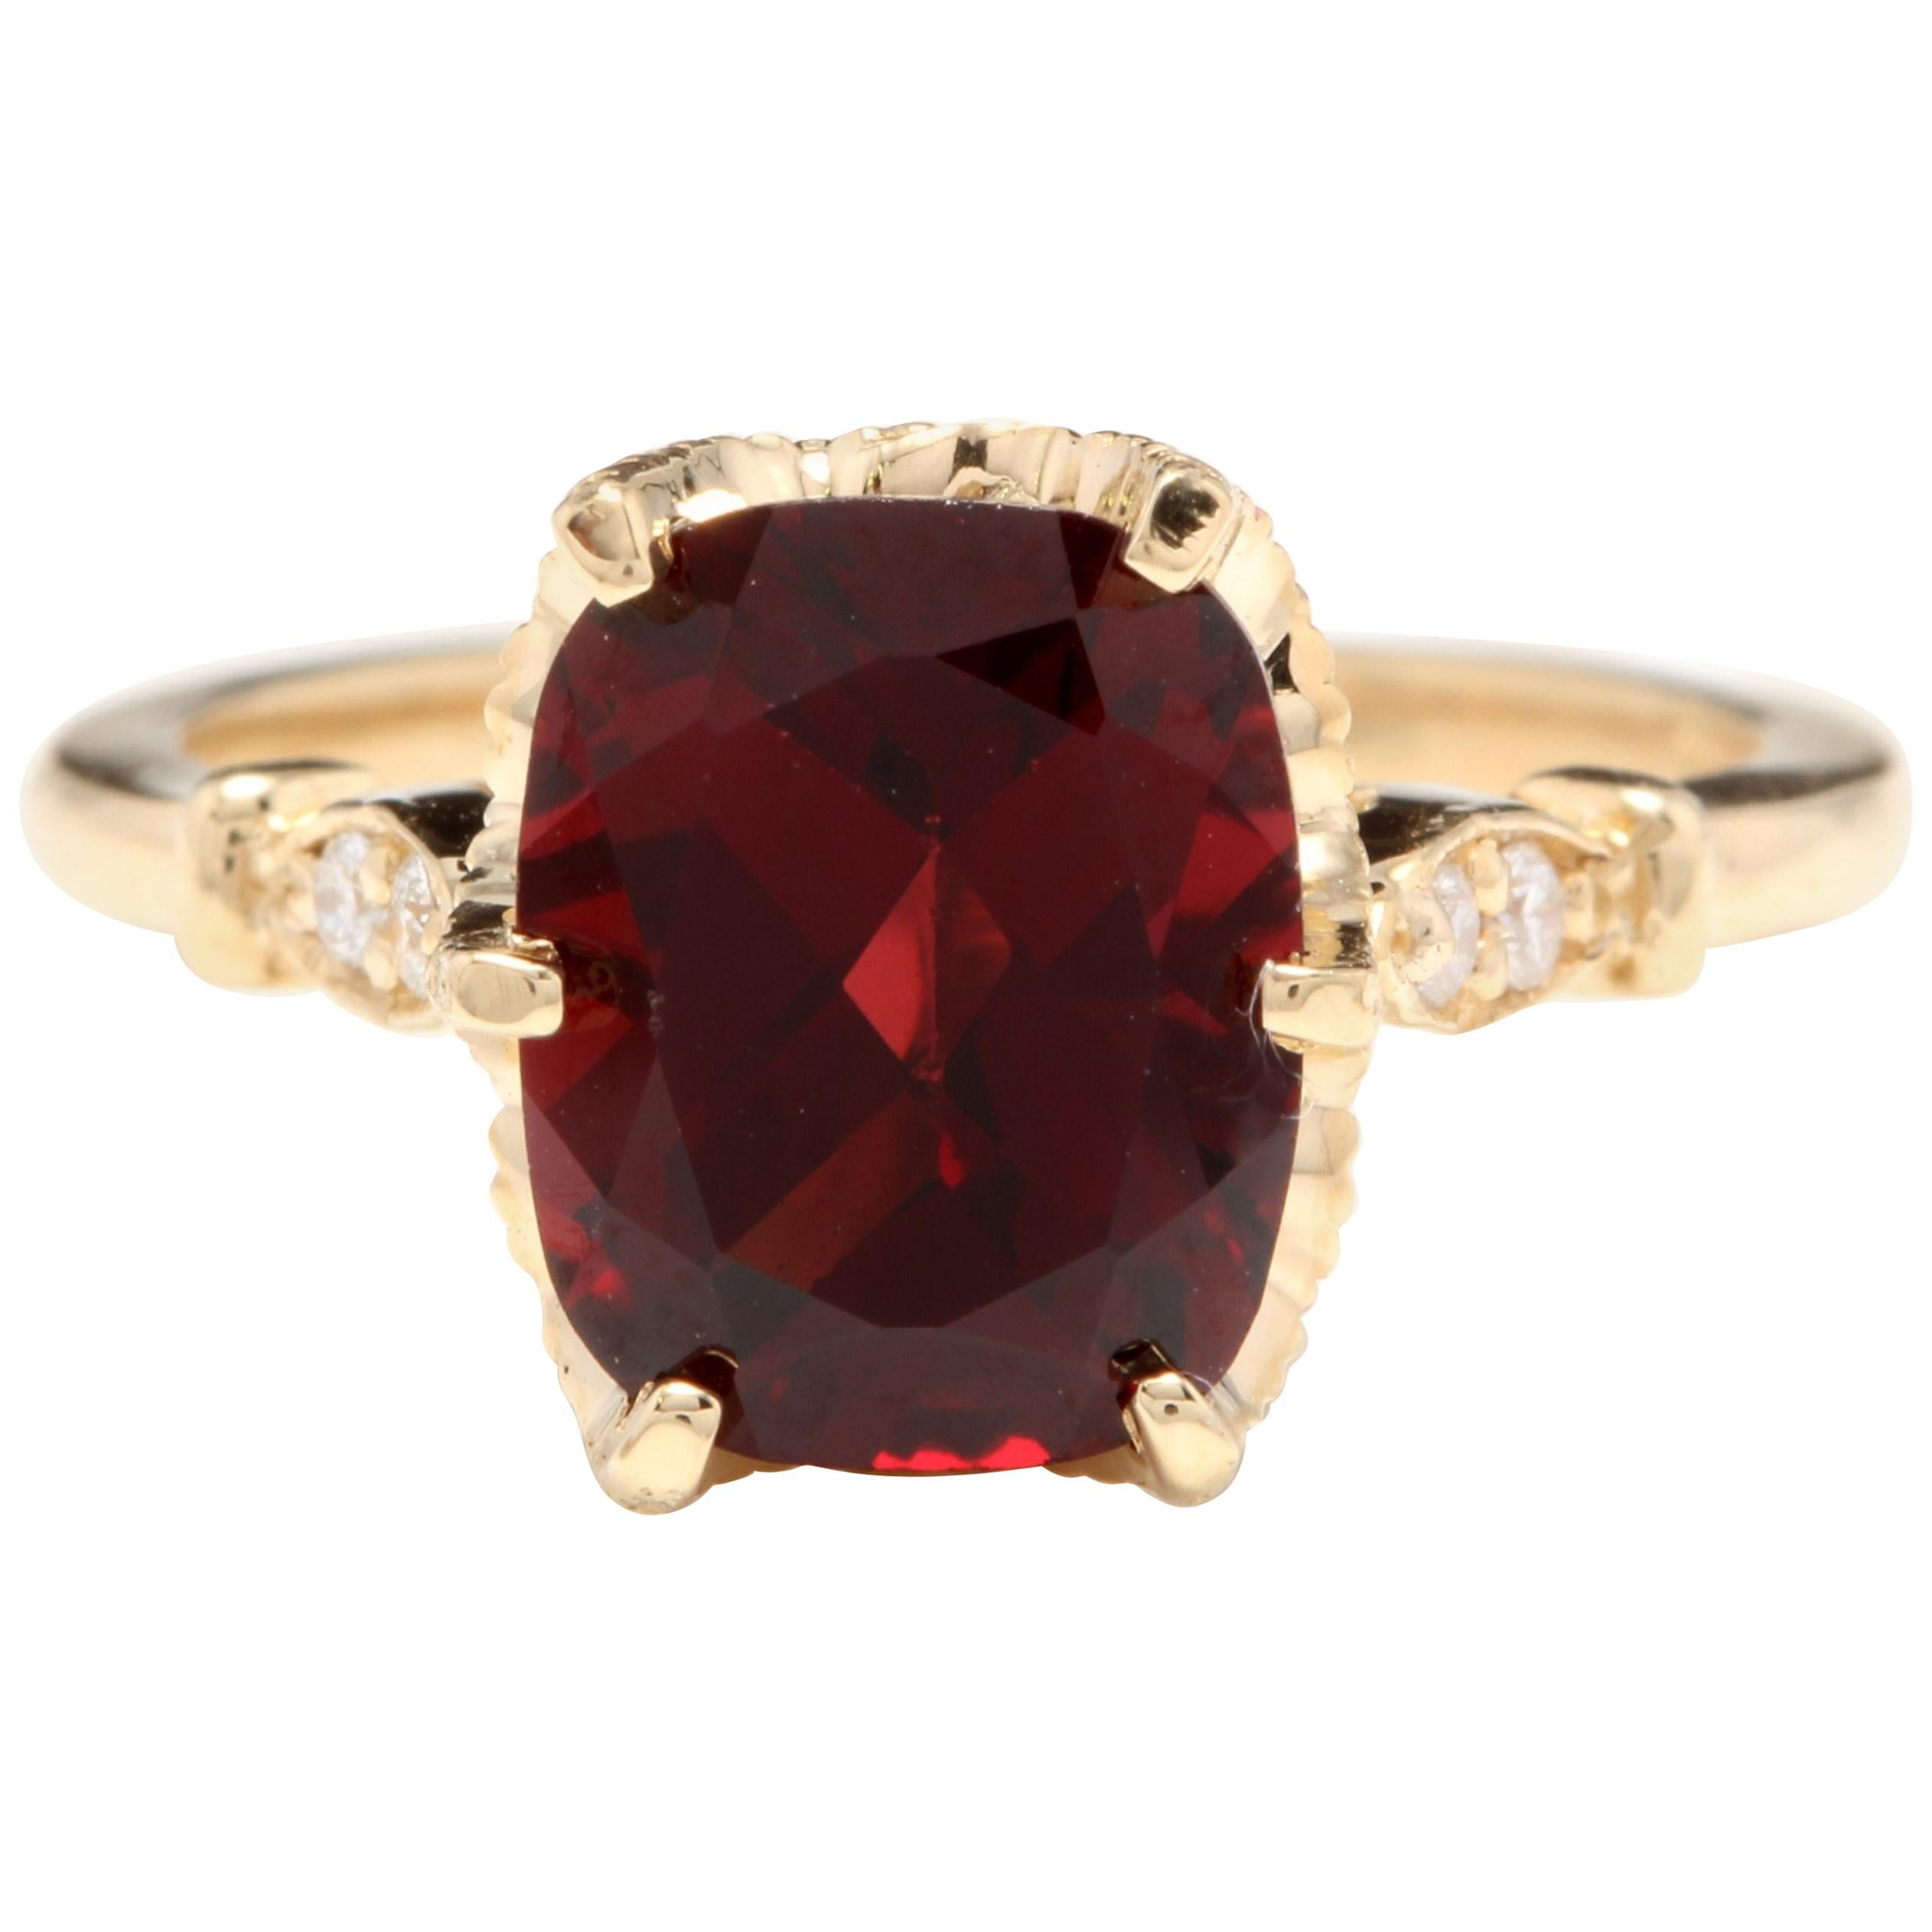 3.68 Carat Natural Garnet and Diamond 14 Karat Solid Yellow Gold Ring